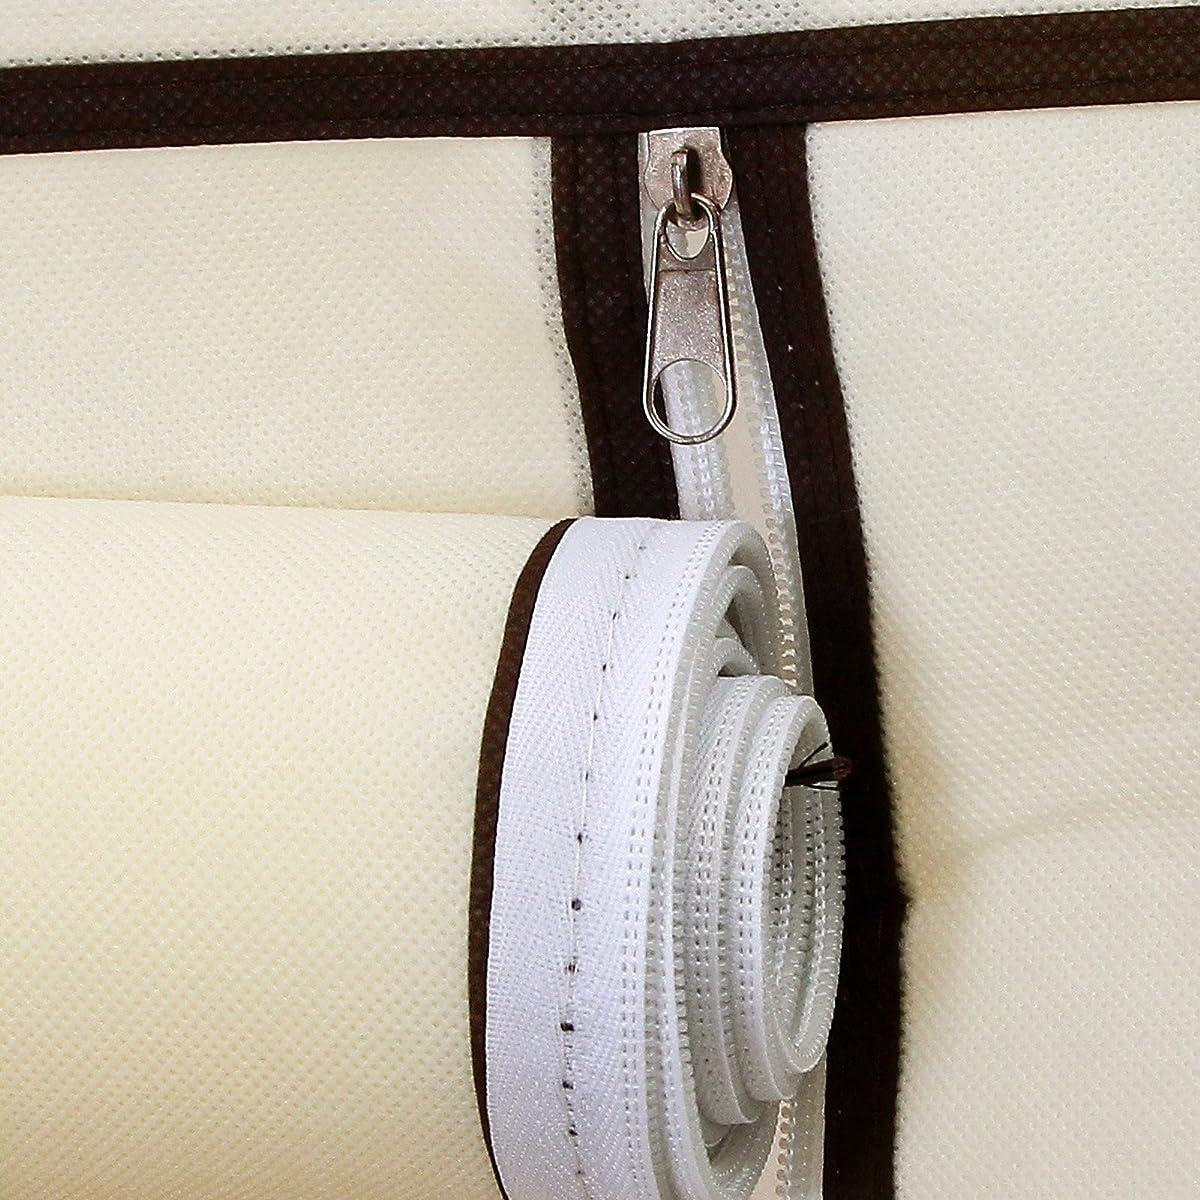 SONGMICS Portable Clothes Closet Non-woven Fabric Wardrobe Double Rod Storage Organizer Beige 59-Inch URYG12M